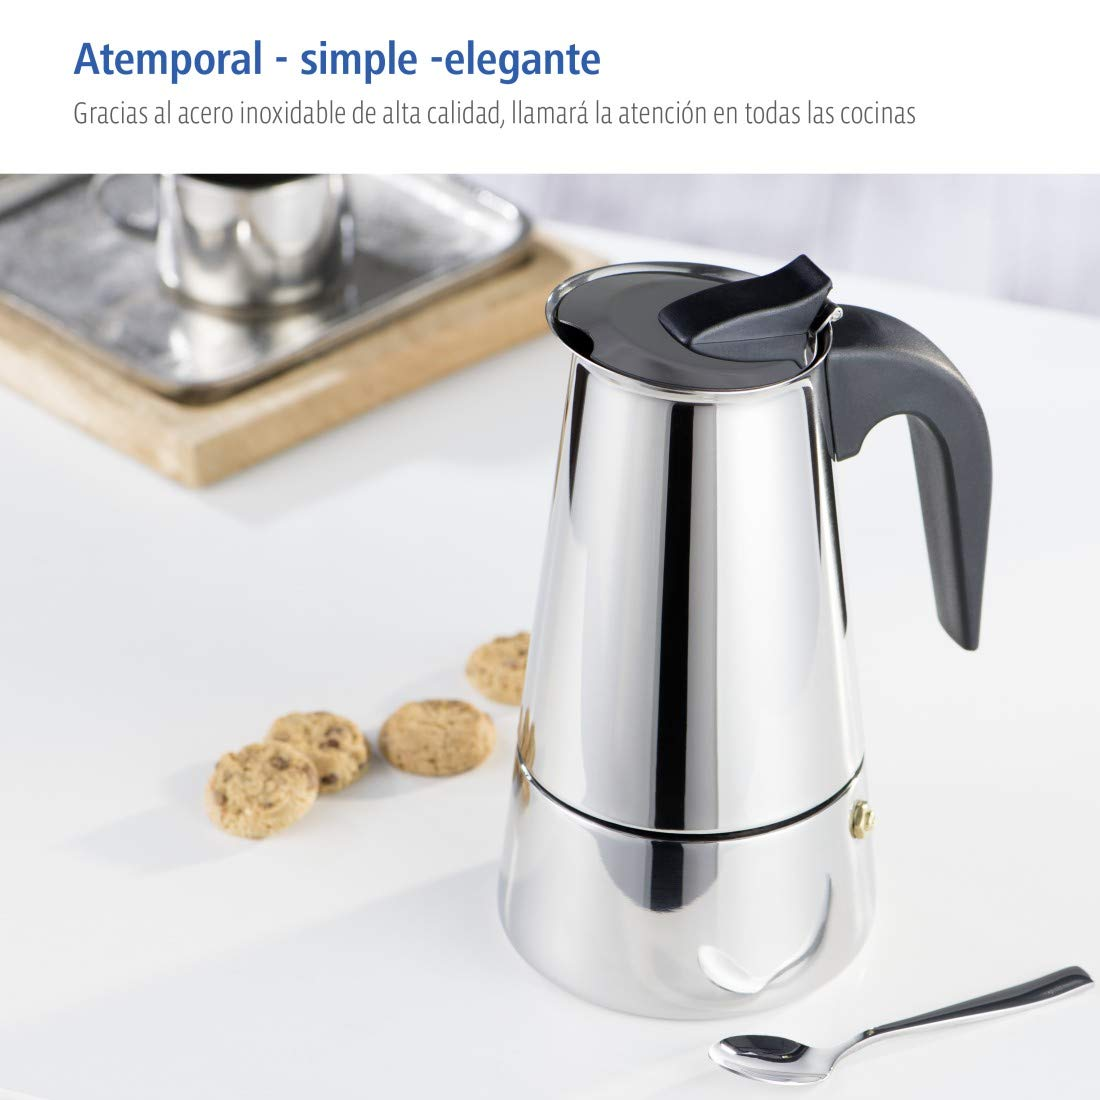 Xavax Cafetera espresso para 6 tazas de café aromático ...